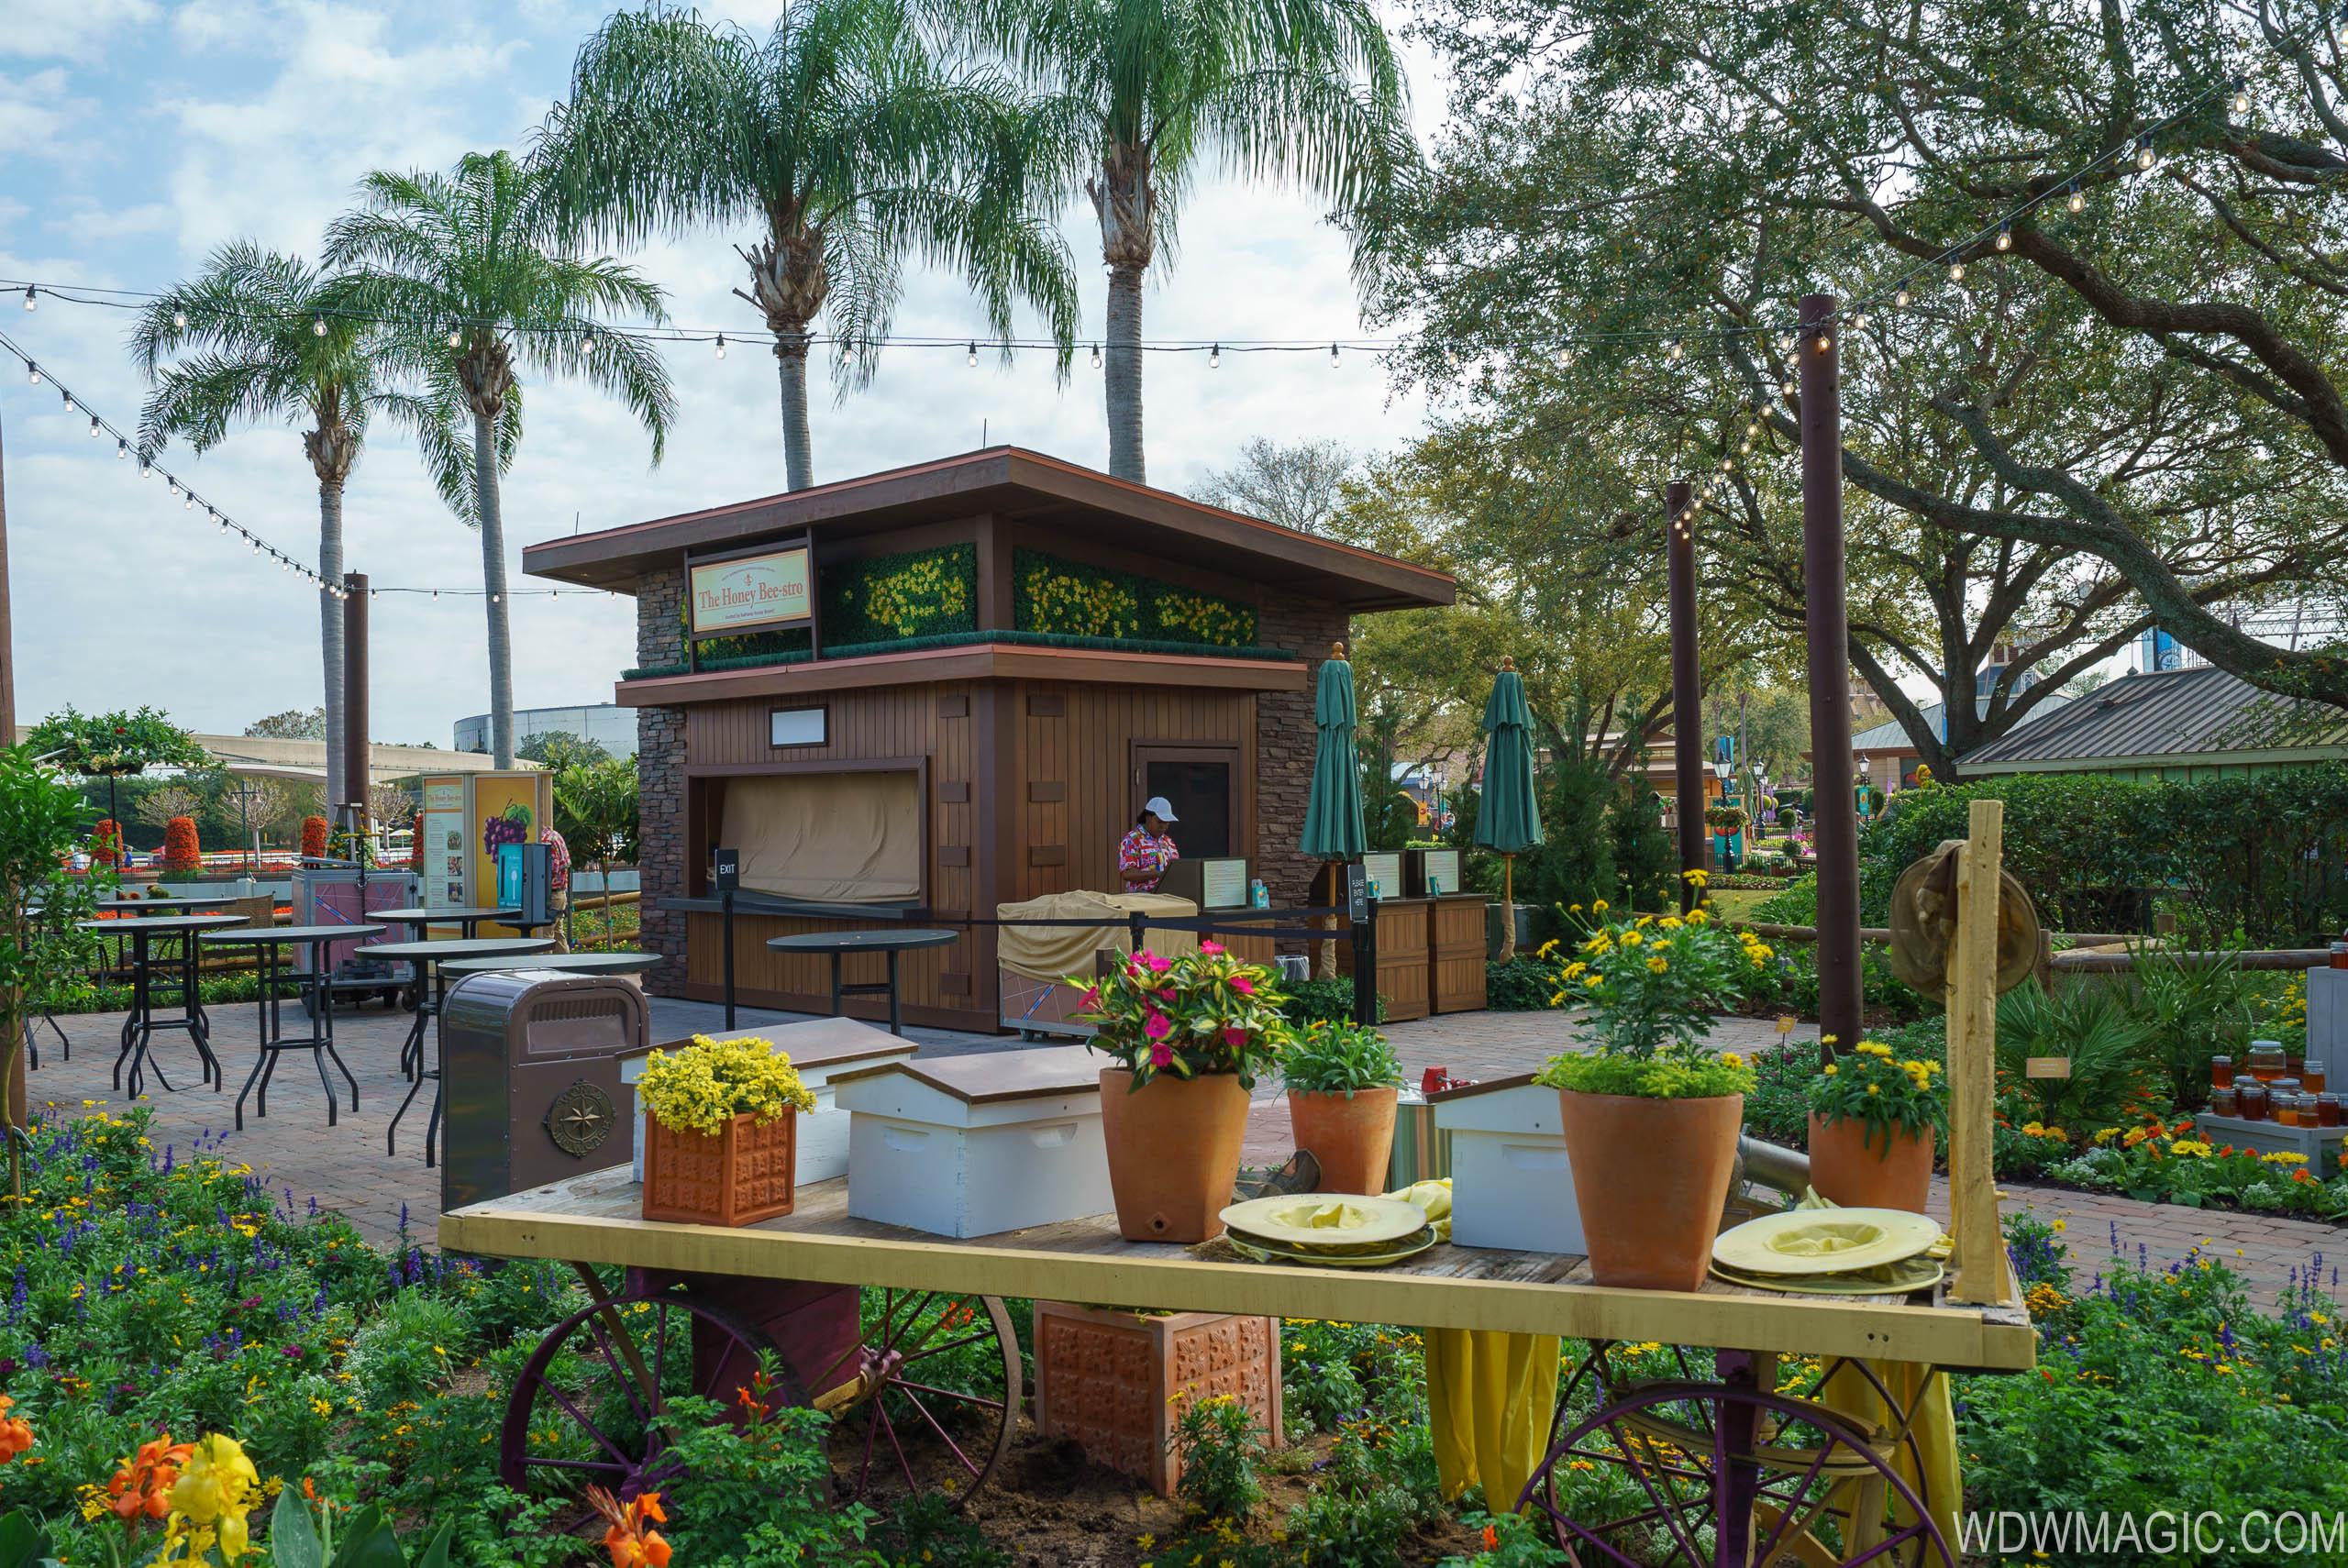 2018 Epcot Flower and Garden Festival Outdoor Kitchen kiosks and menus